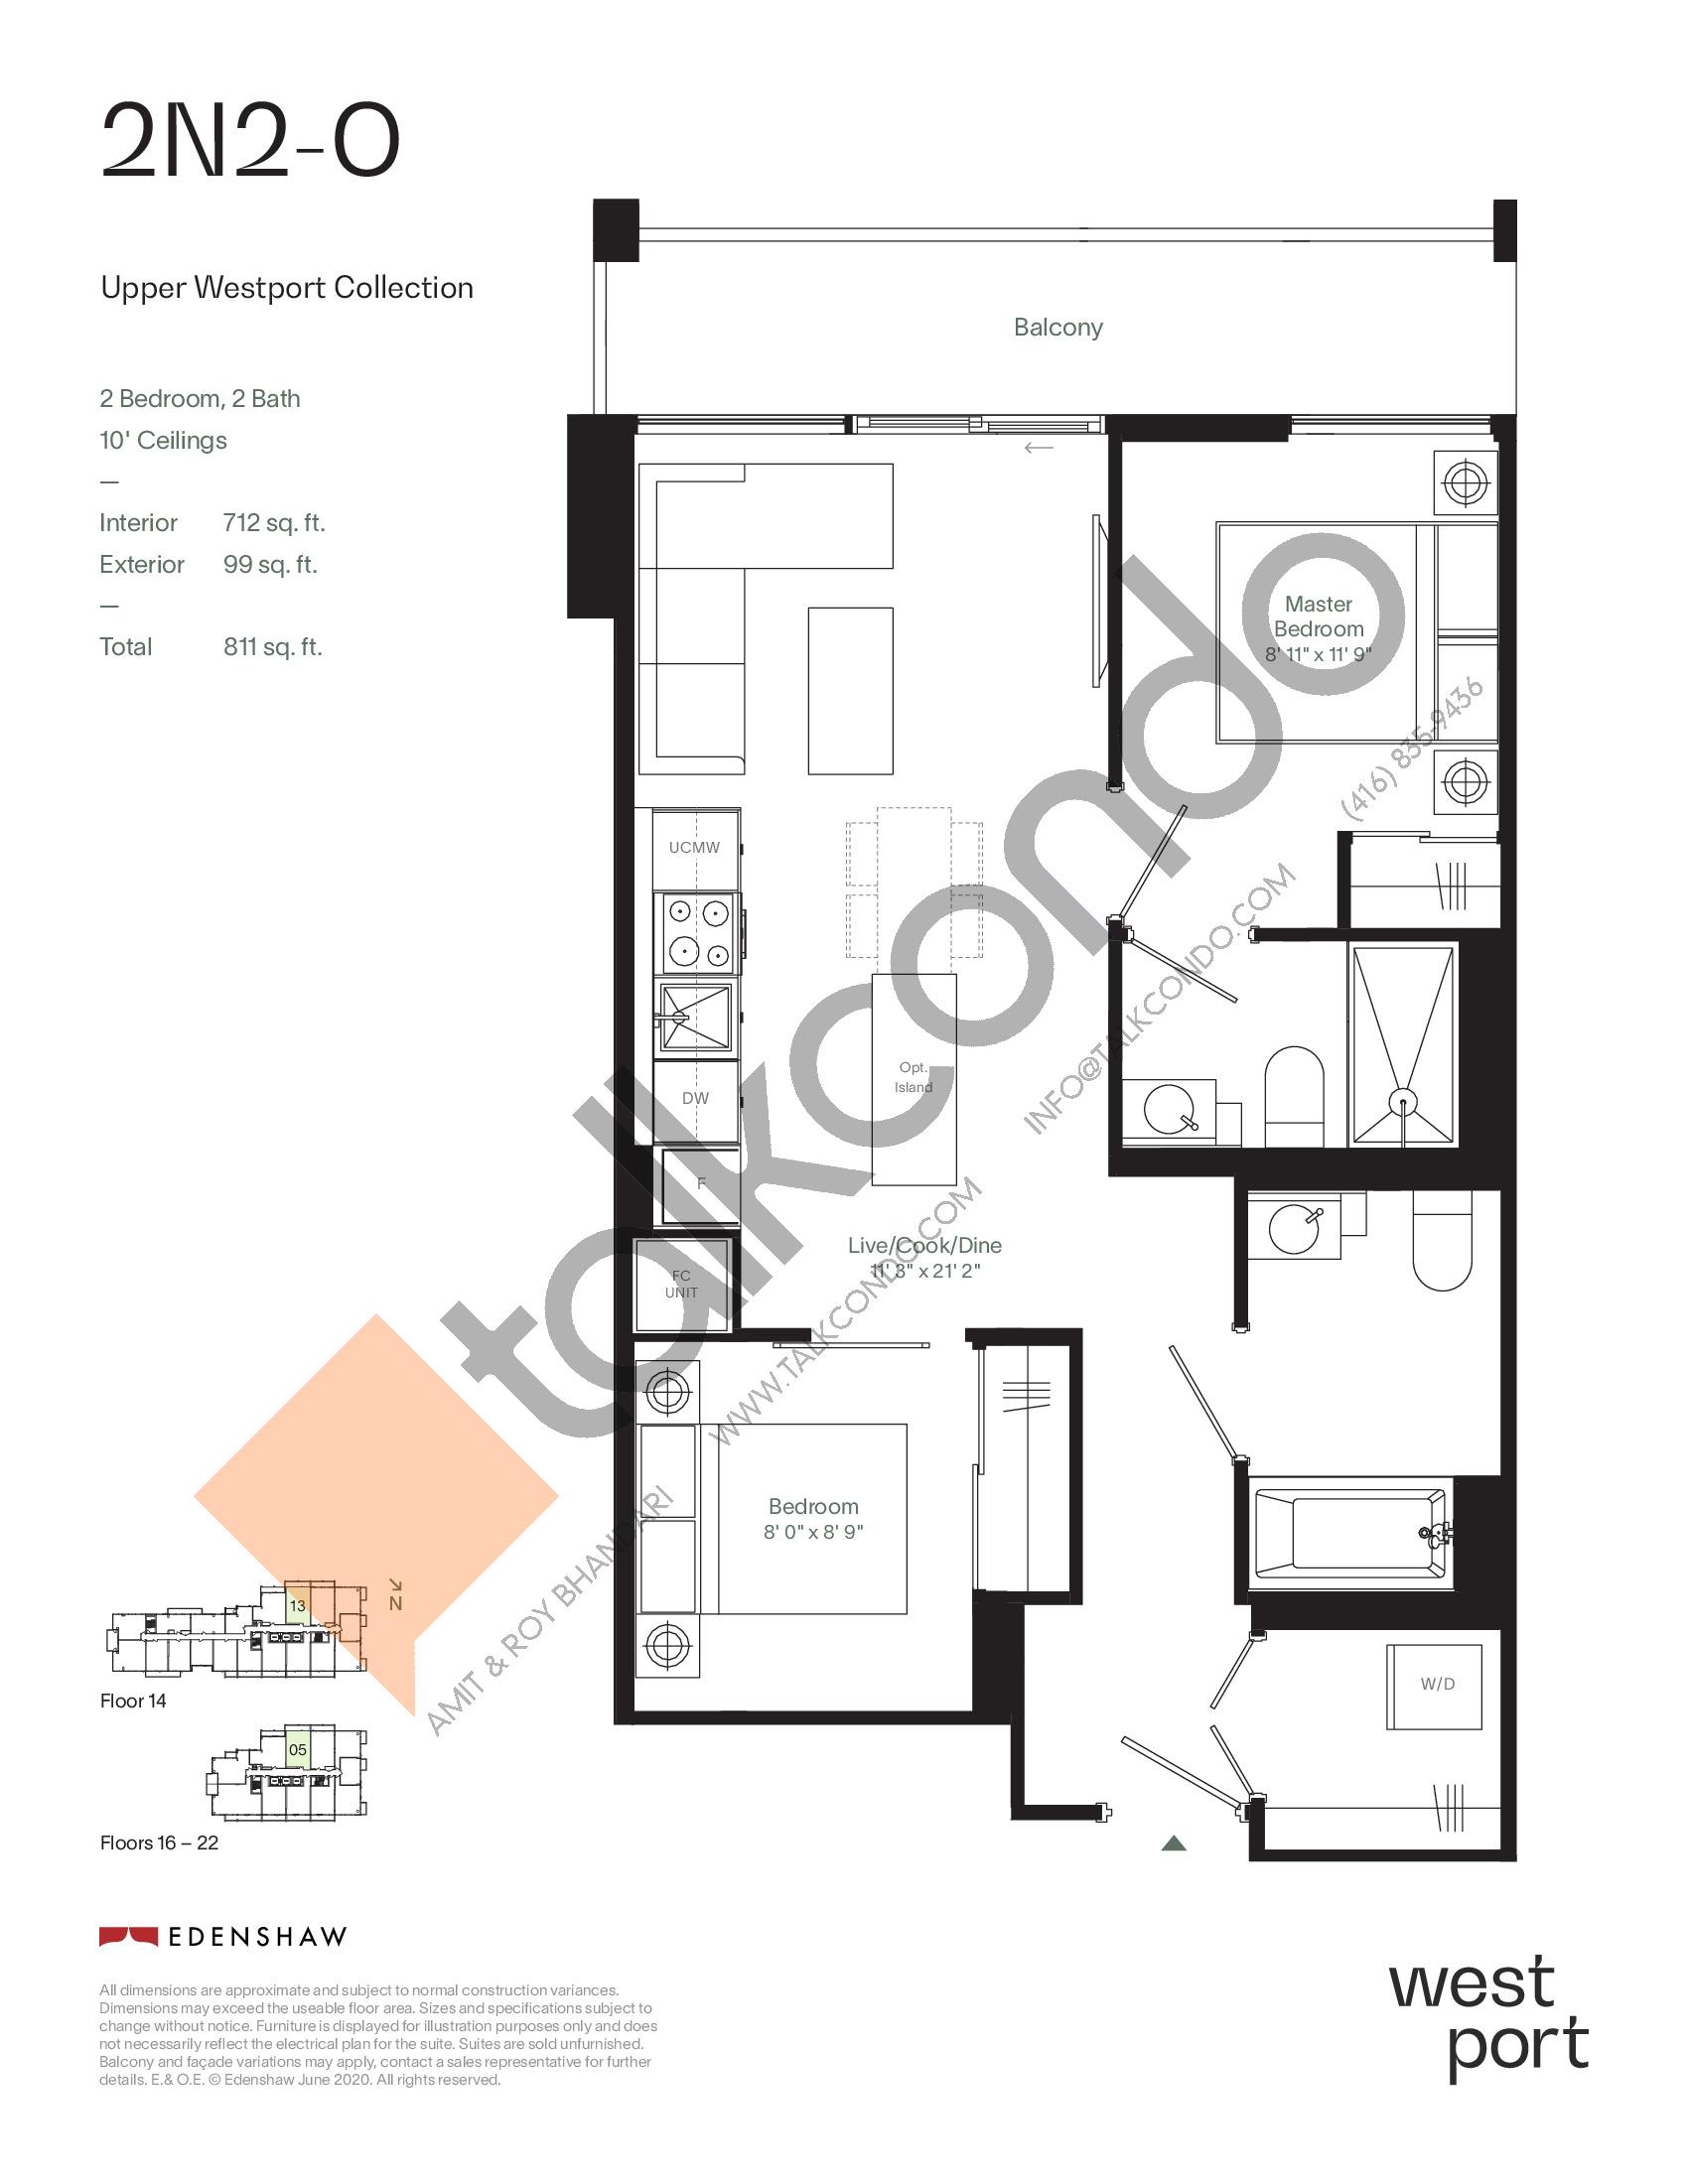 2N2-O - Upper Westport Collection Floor Plan at Westport Condos - 712 sq.ft